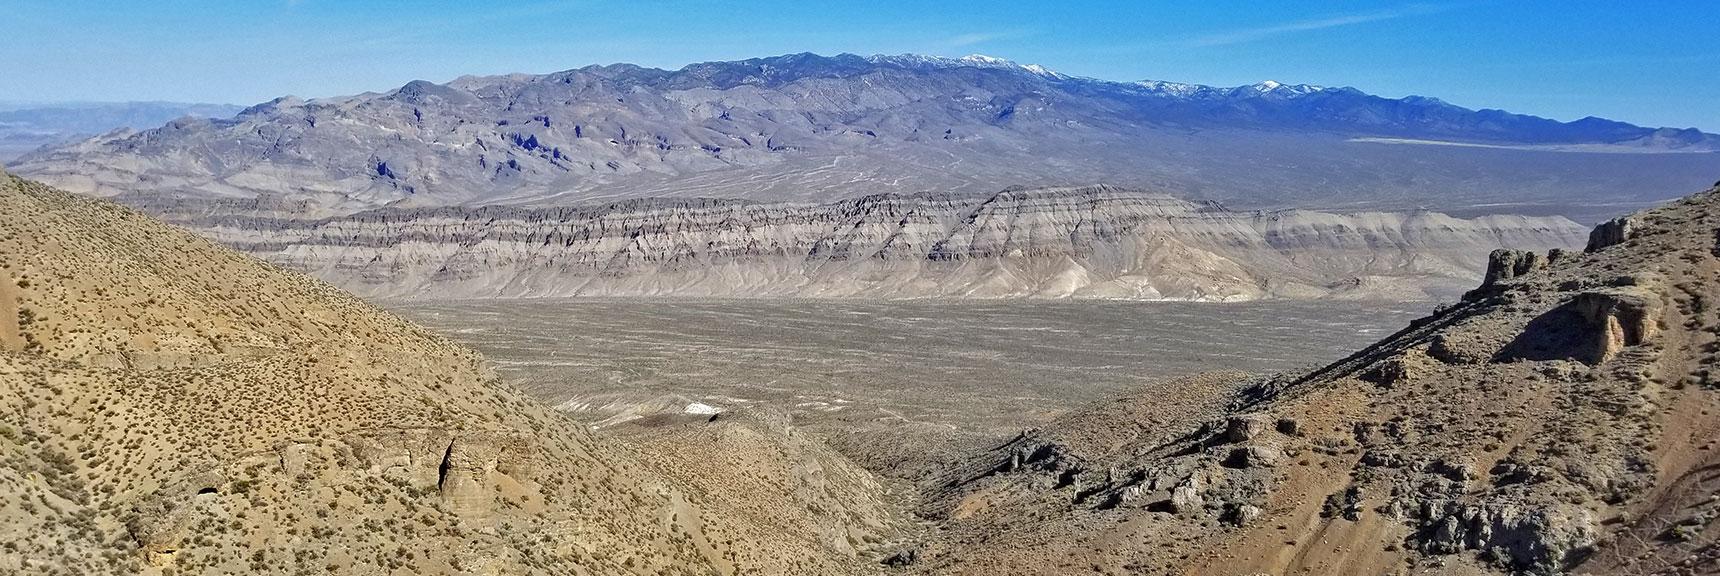 View Down the Gass Peak Mid-Summit Ridge Northern Canyon to the Sheep Range | Gass Peak Eastern Summit Ultra-marathon Adventure, Nevada